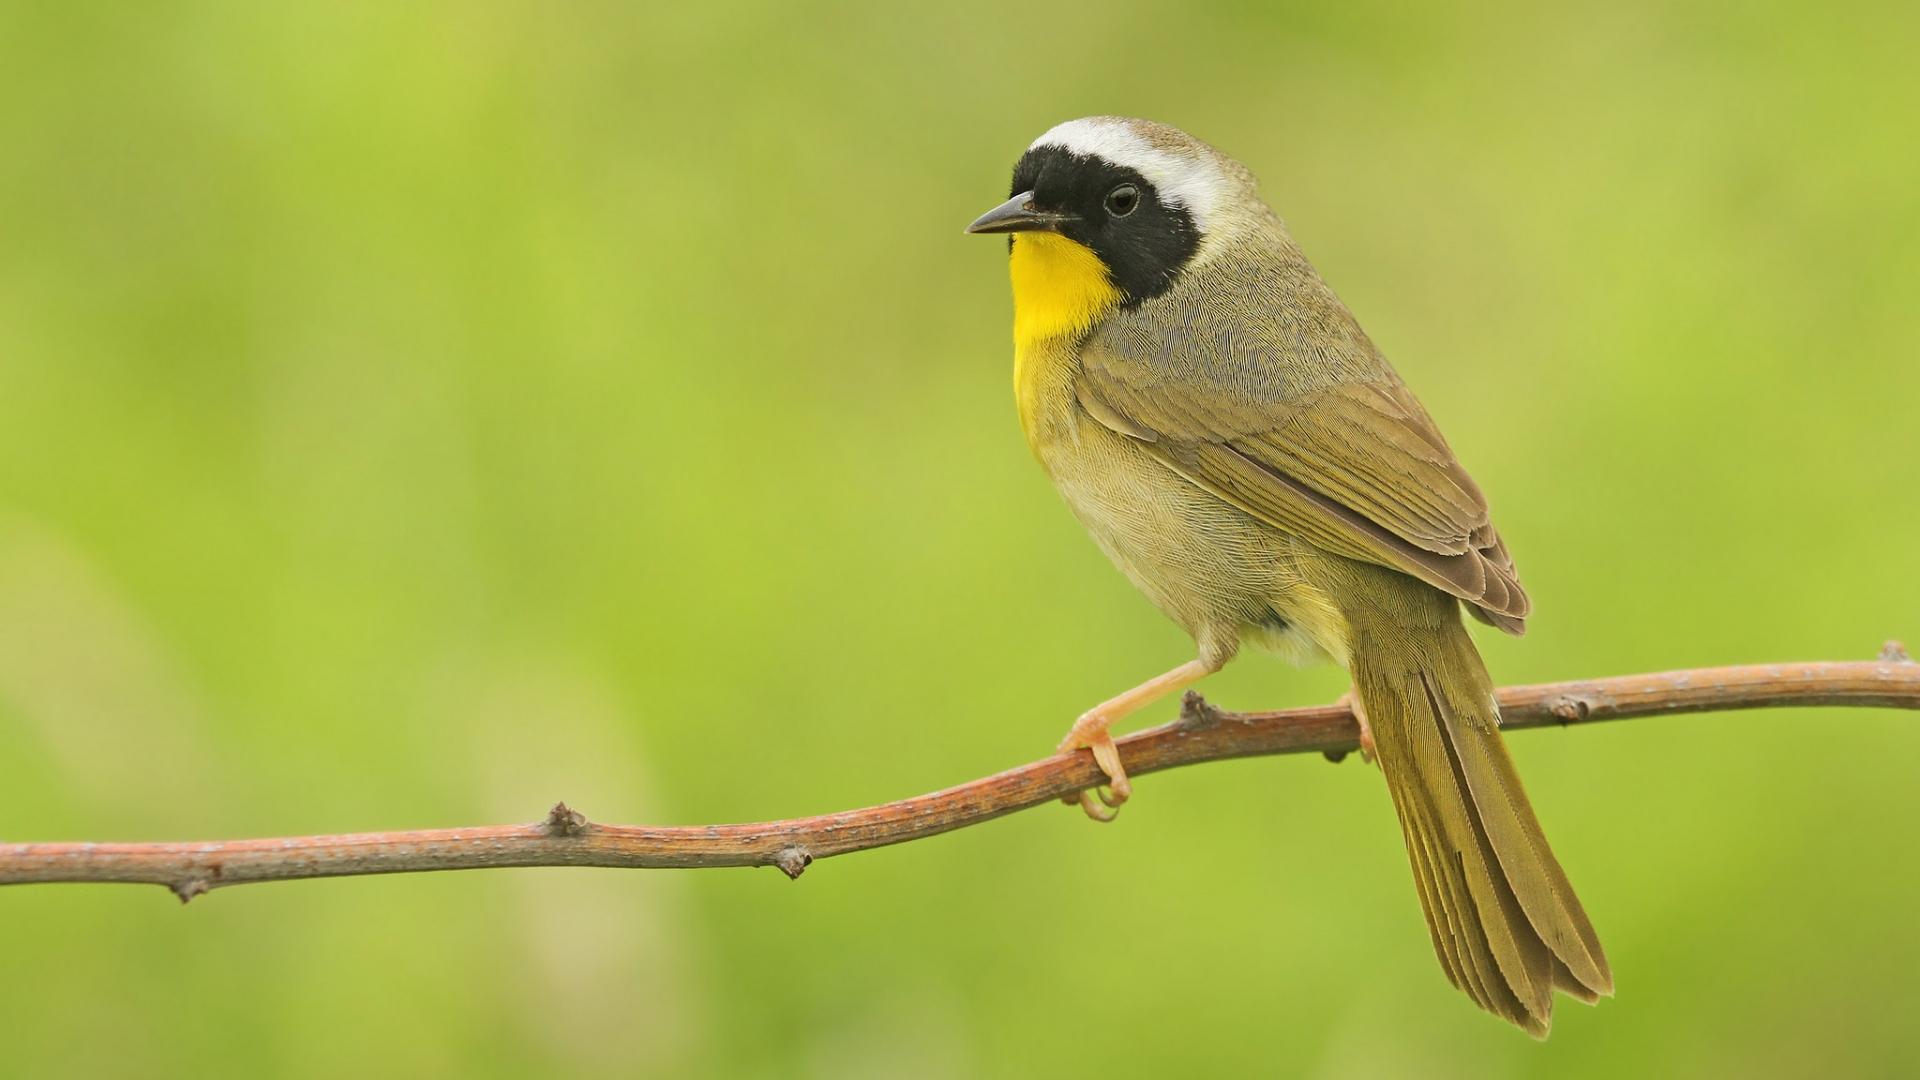 Pájaro pecho amarillo - 1920x1080